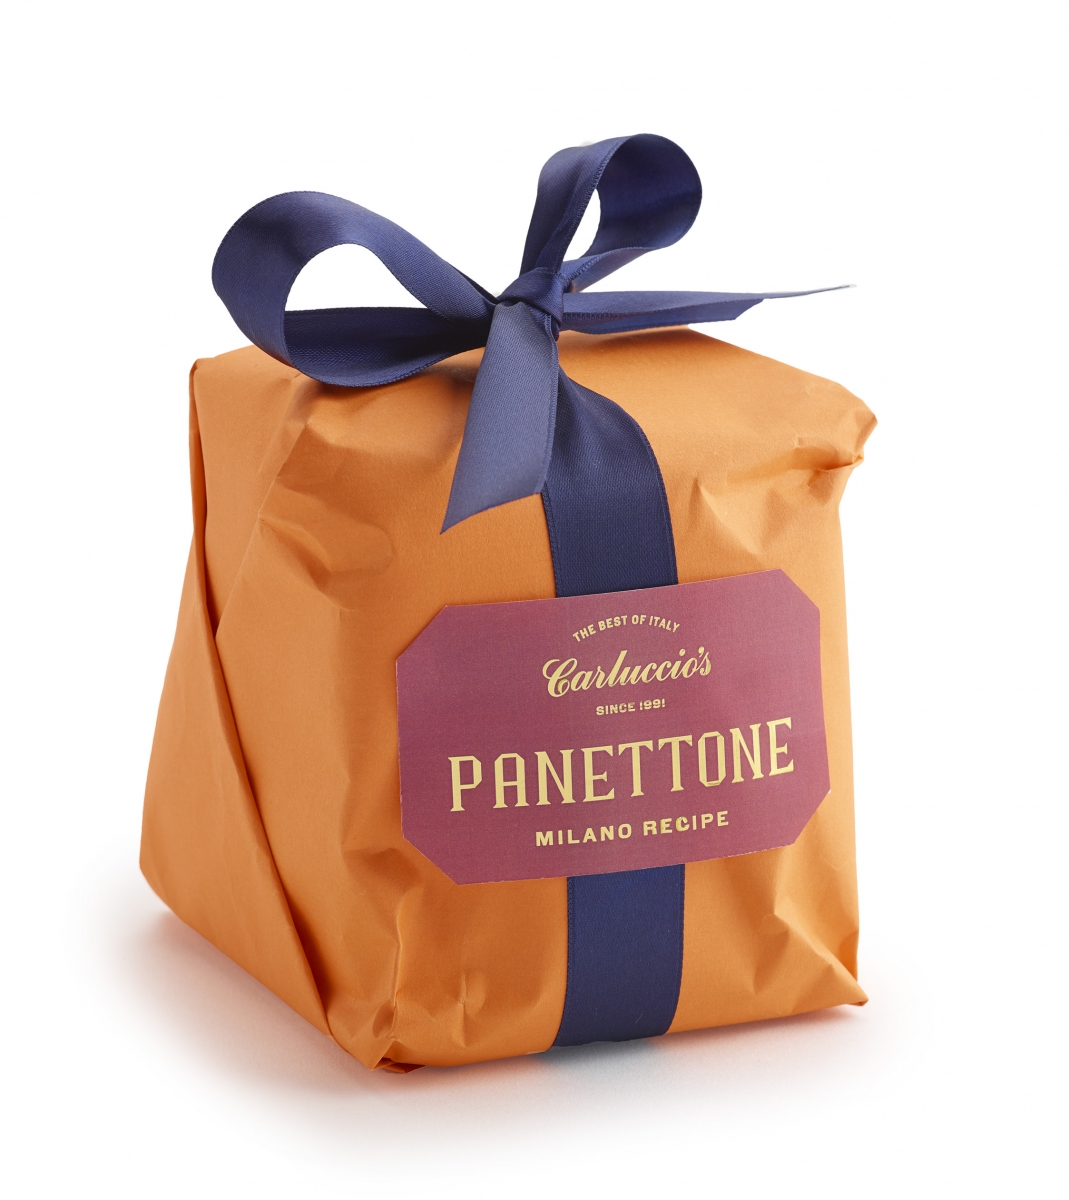 Panettone 450g £9.95